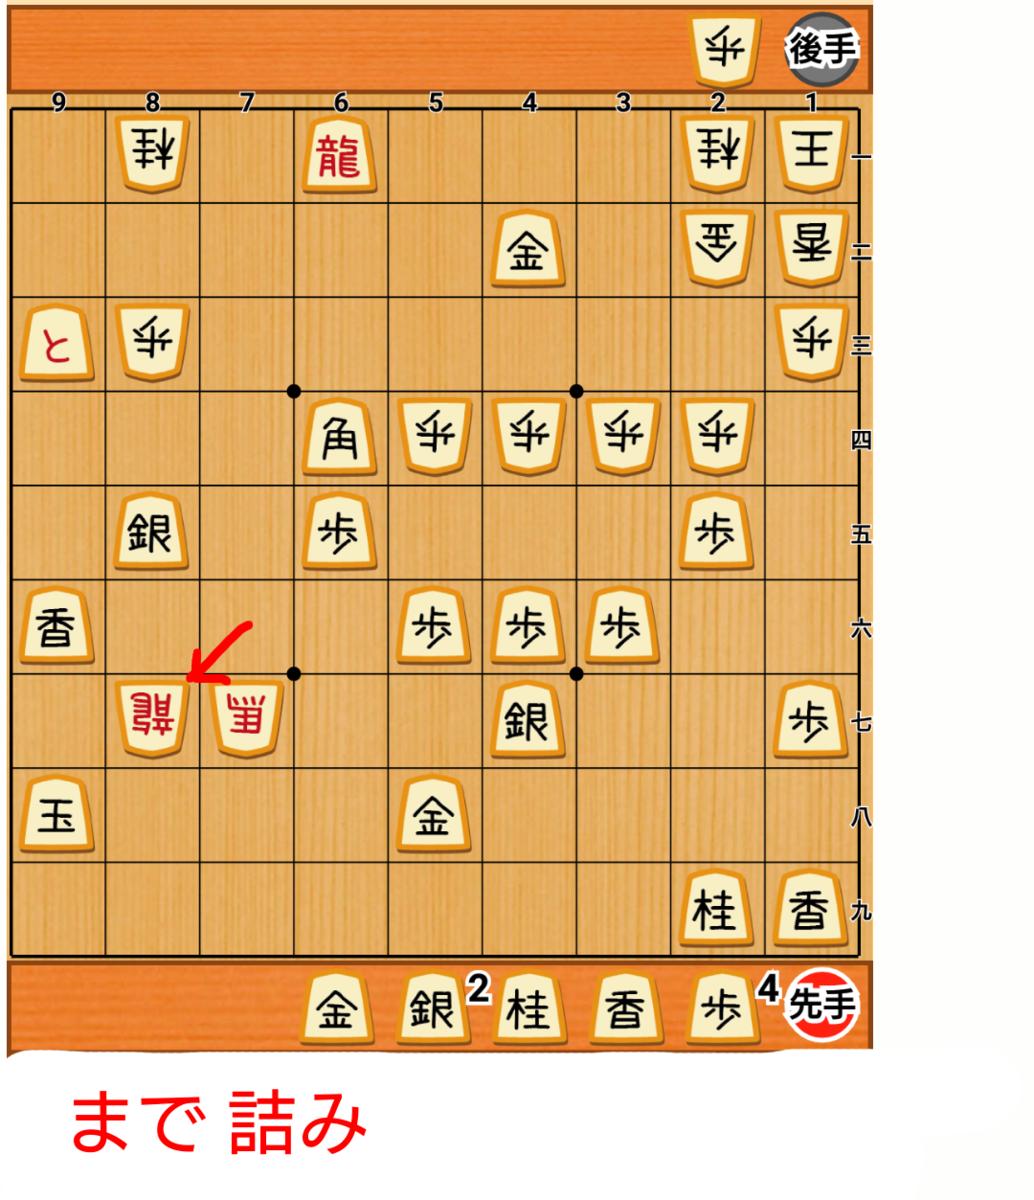 f:id:nao-shodan:20200913150322p:plain